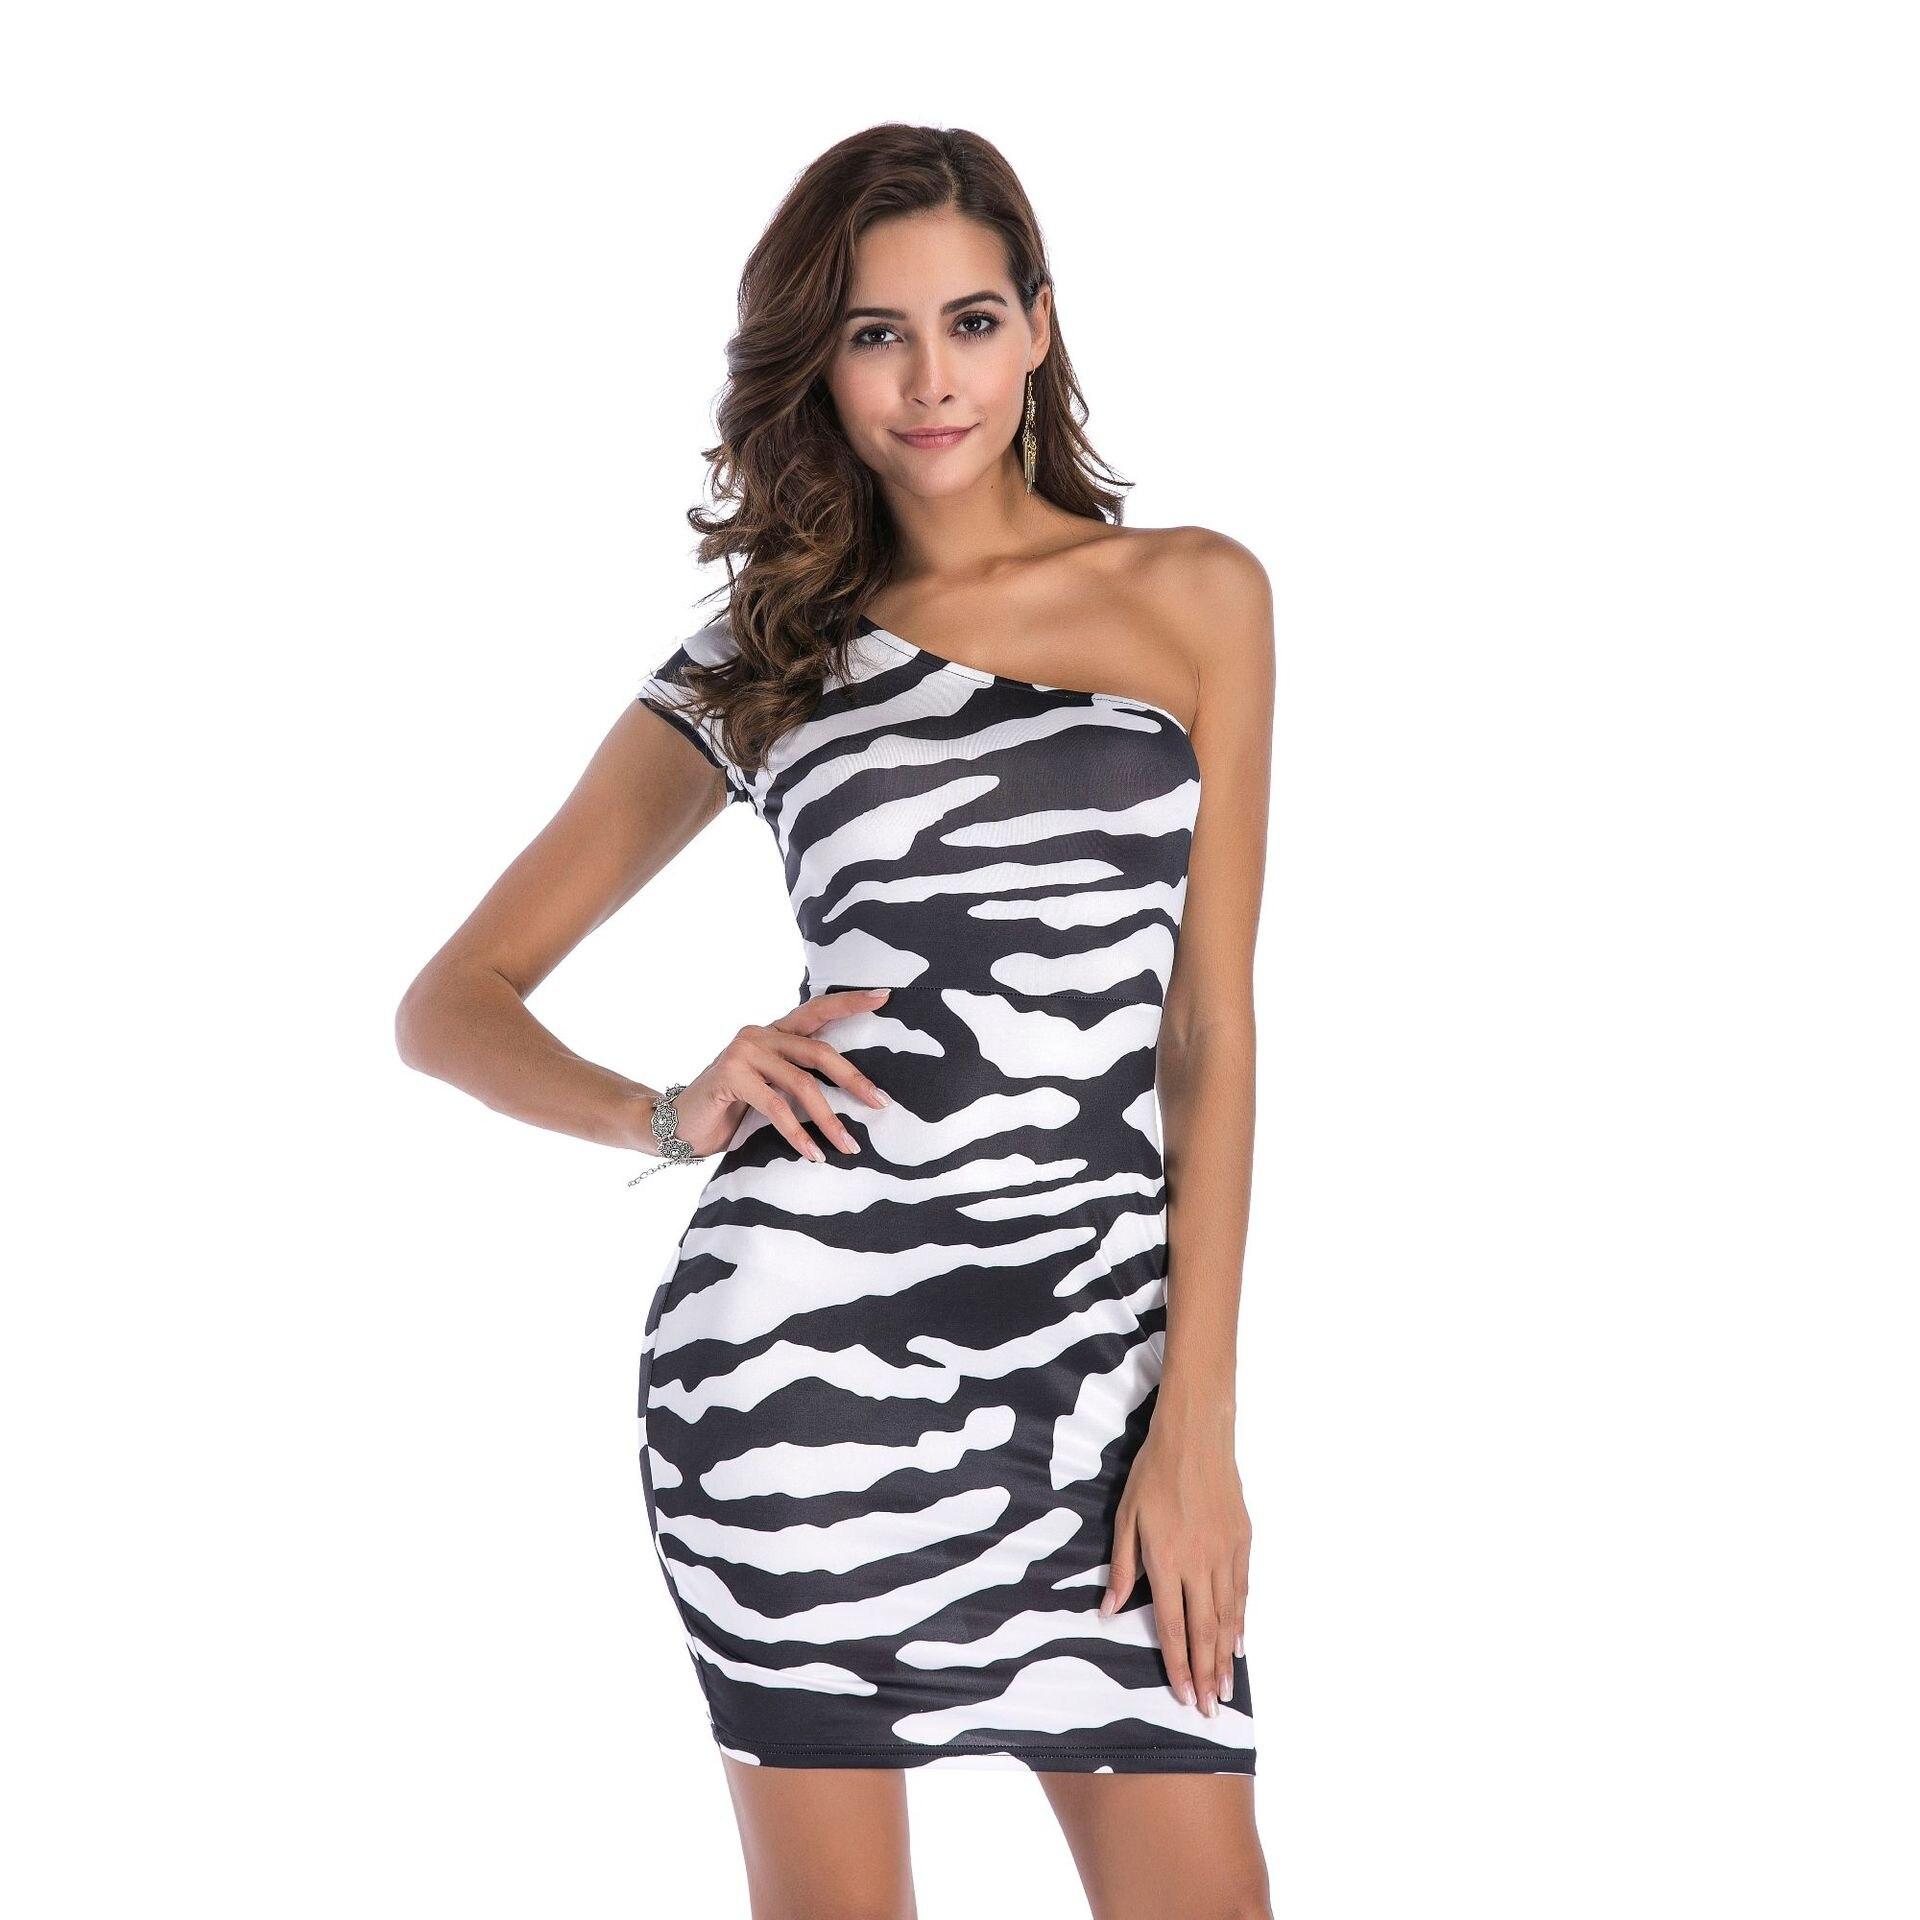 61dfd8300b Buy zebra dress sexy and get free shipping on AliExpress.com